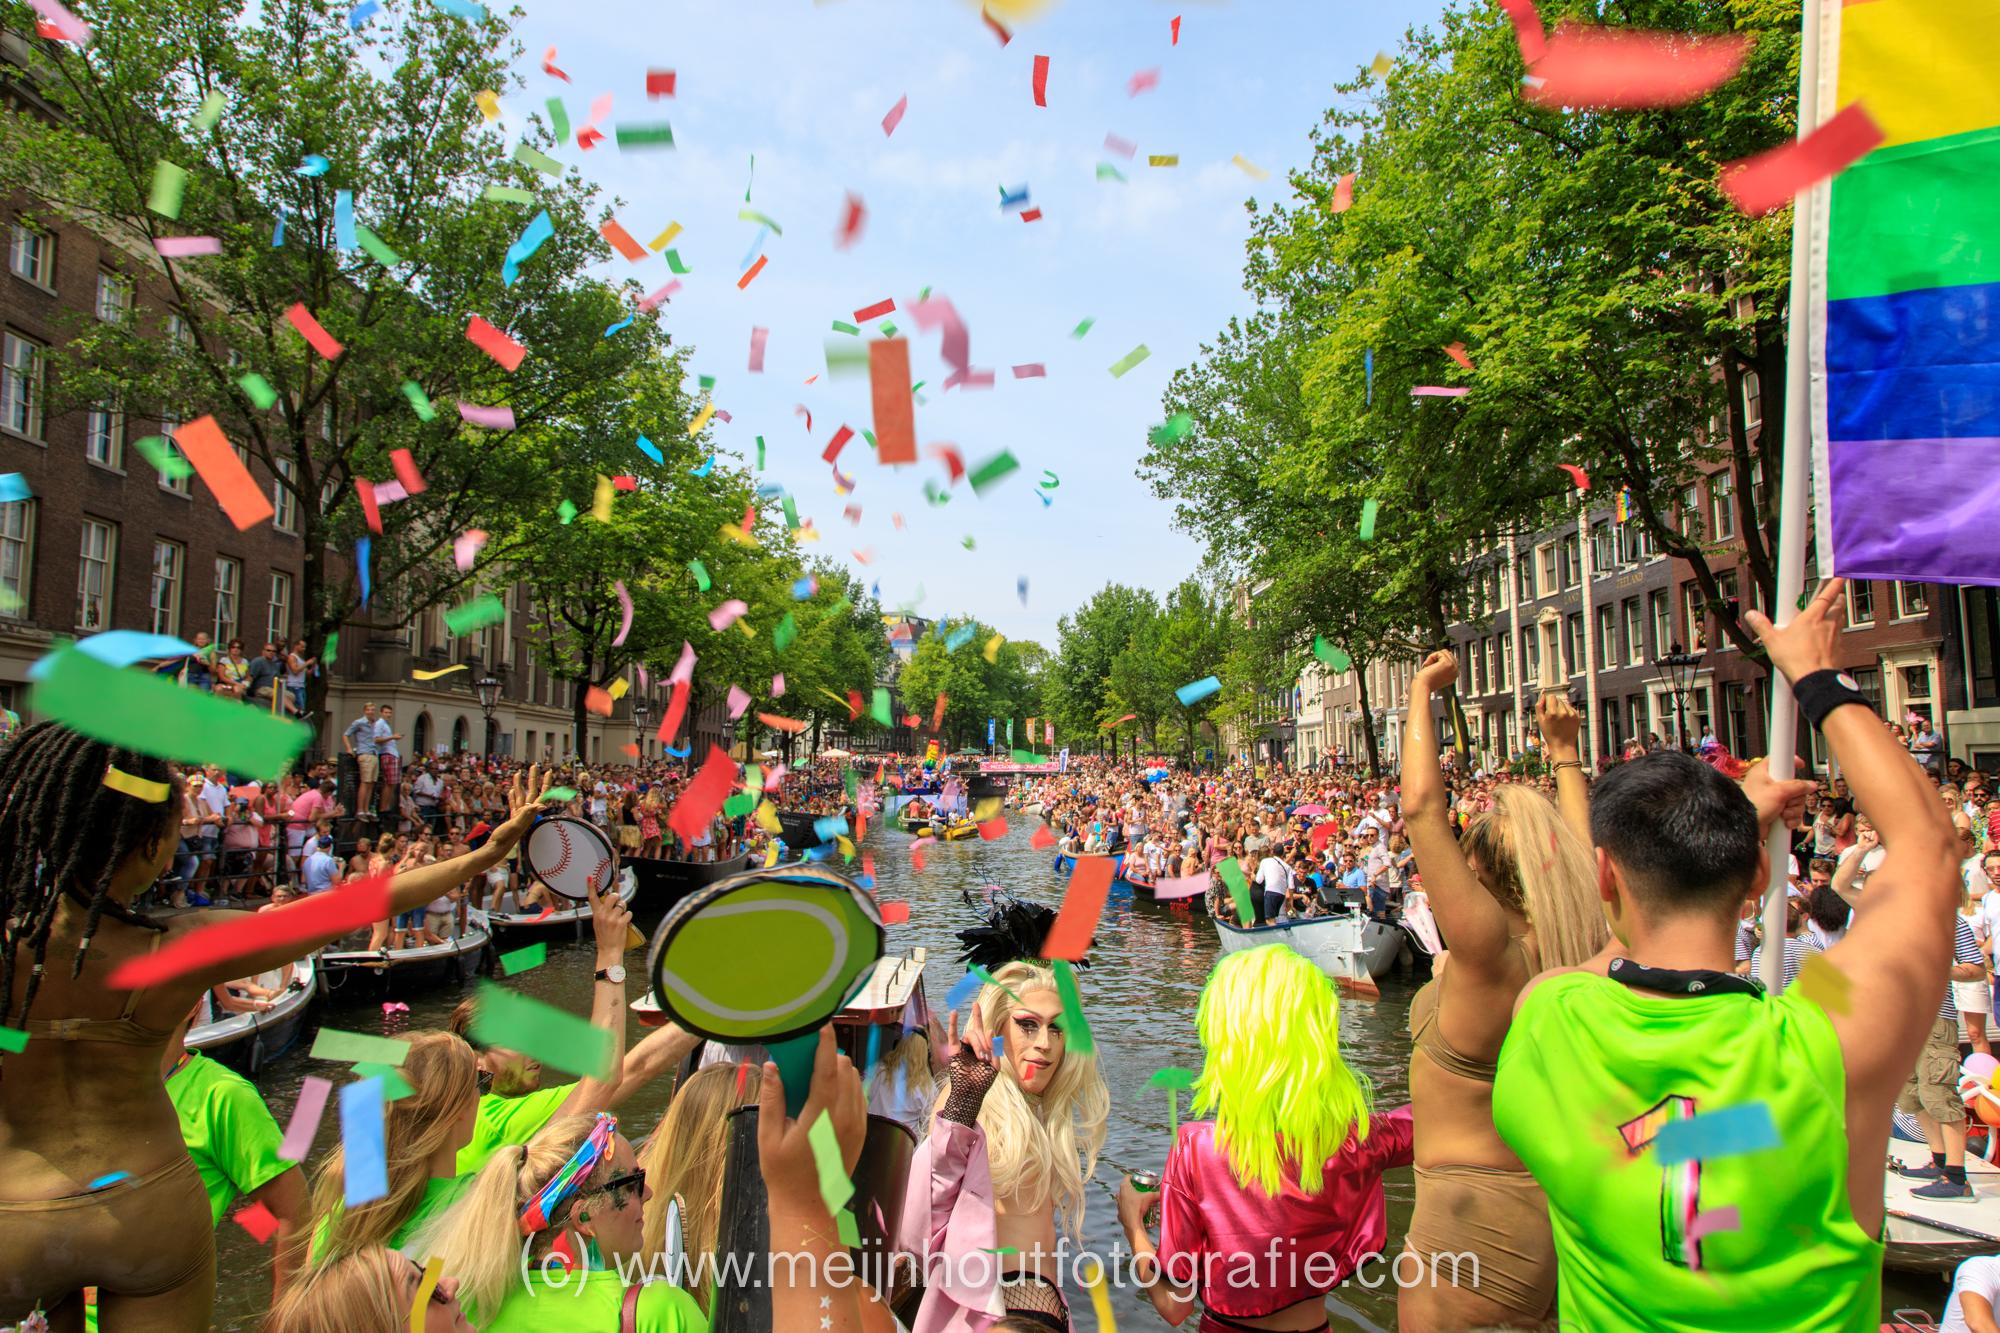 20180804-_MG_0346 Deloitte Gay Pride 2018.jpg